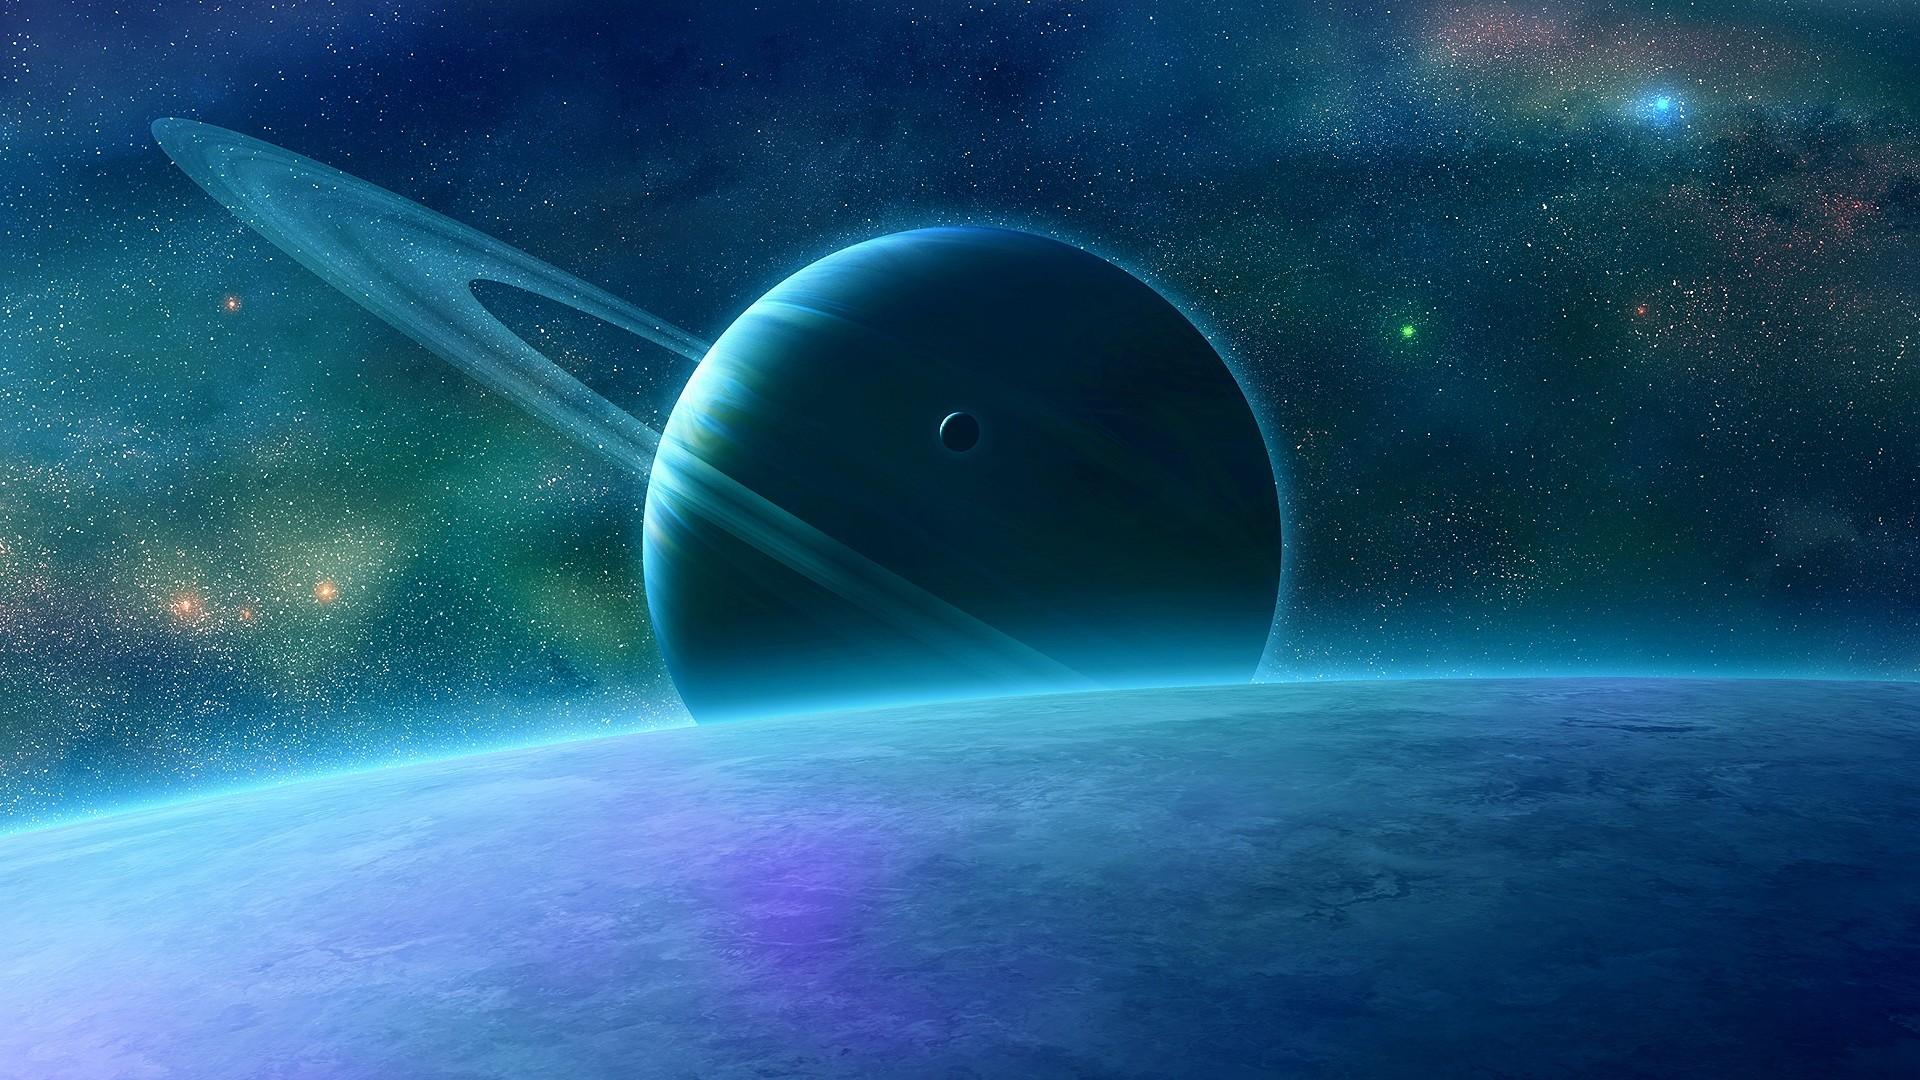 Wallpaper planet, rings, sky, space